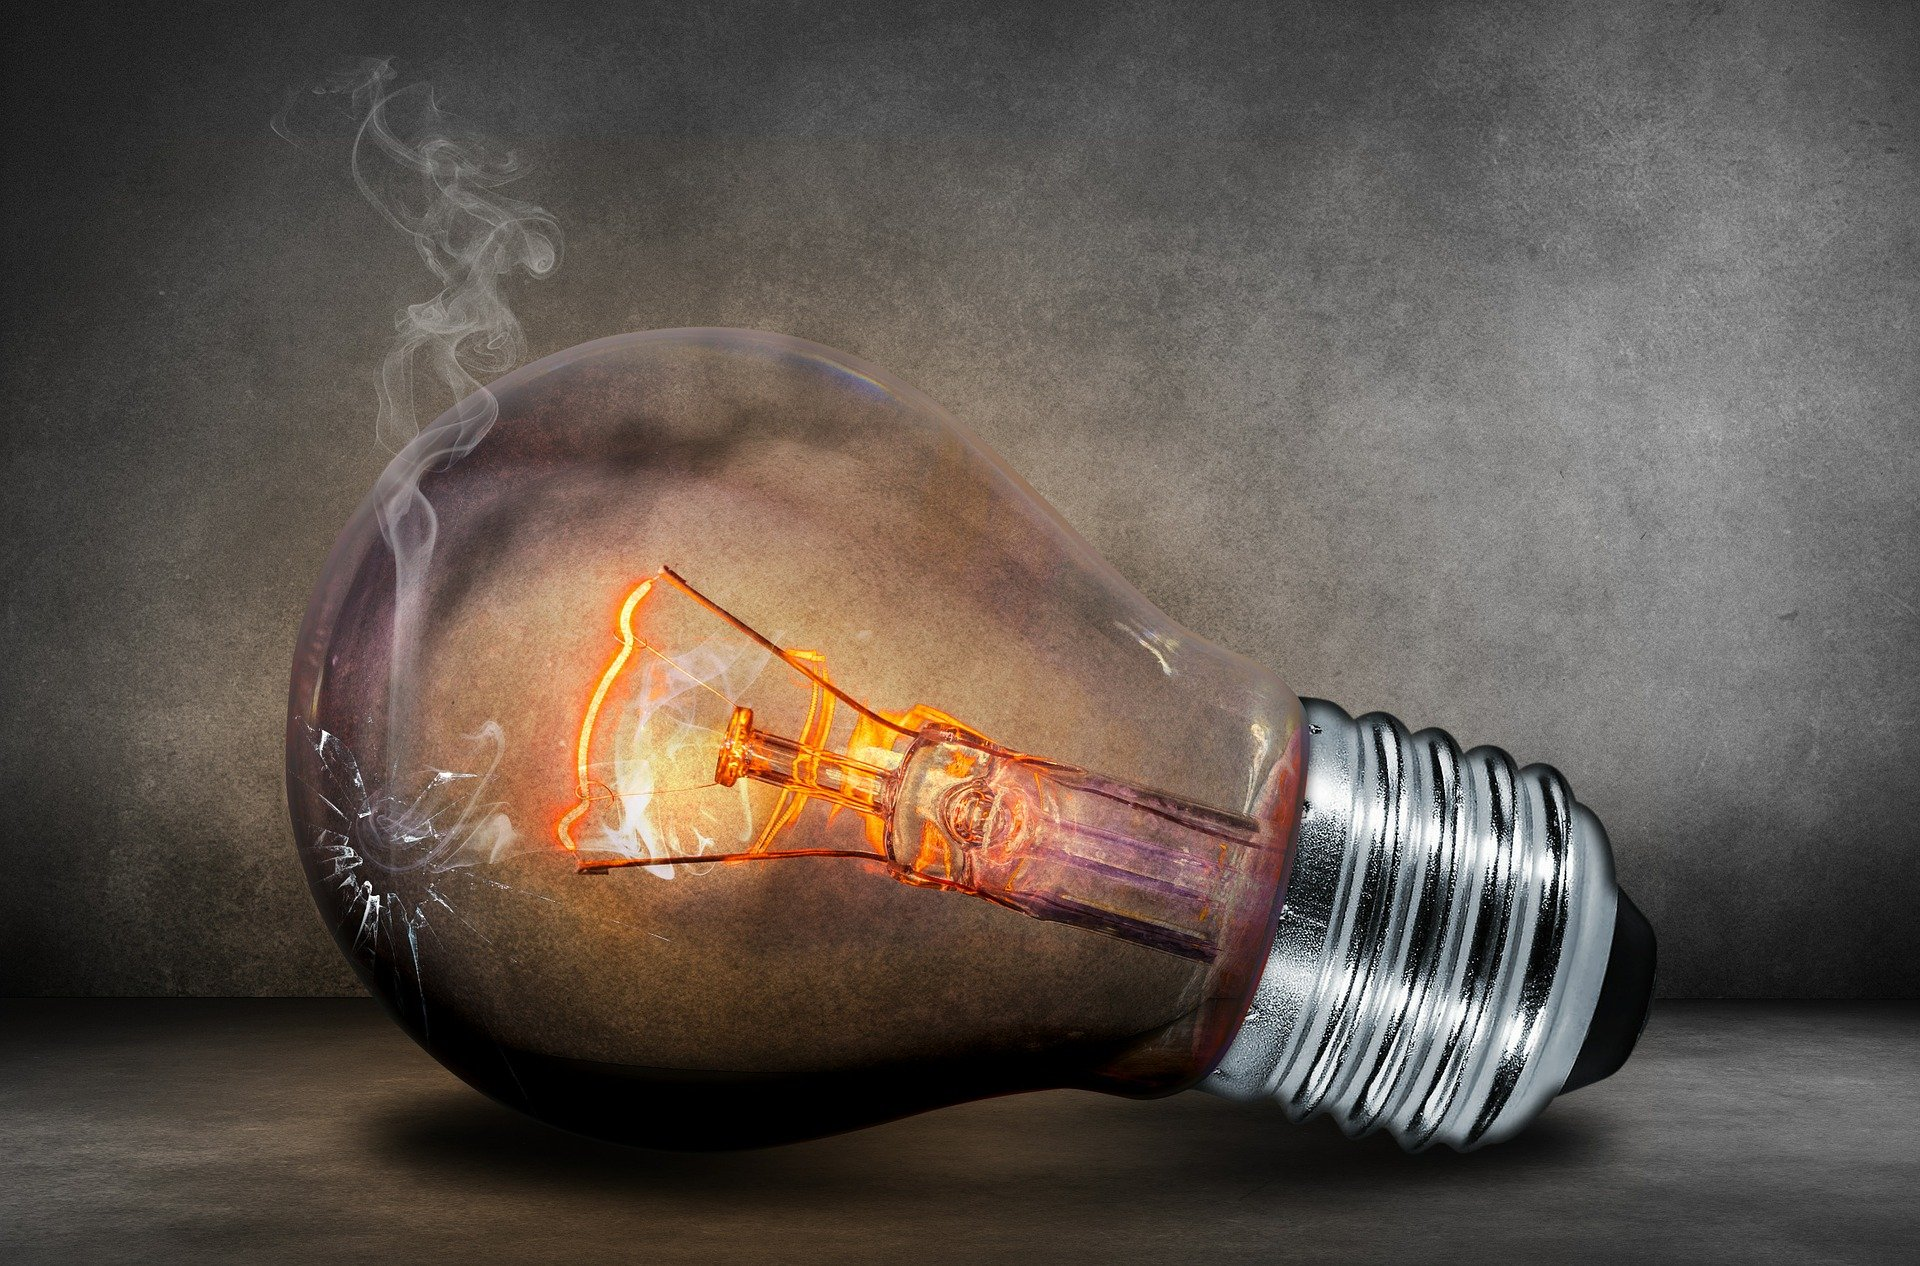 Consumo de energia diminuiu em Portugal